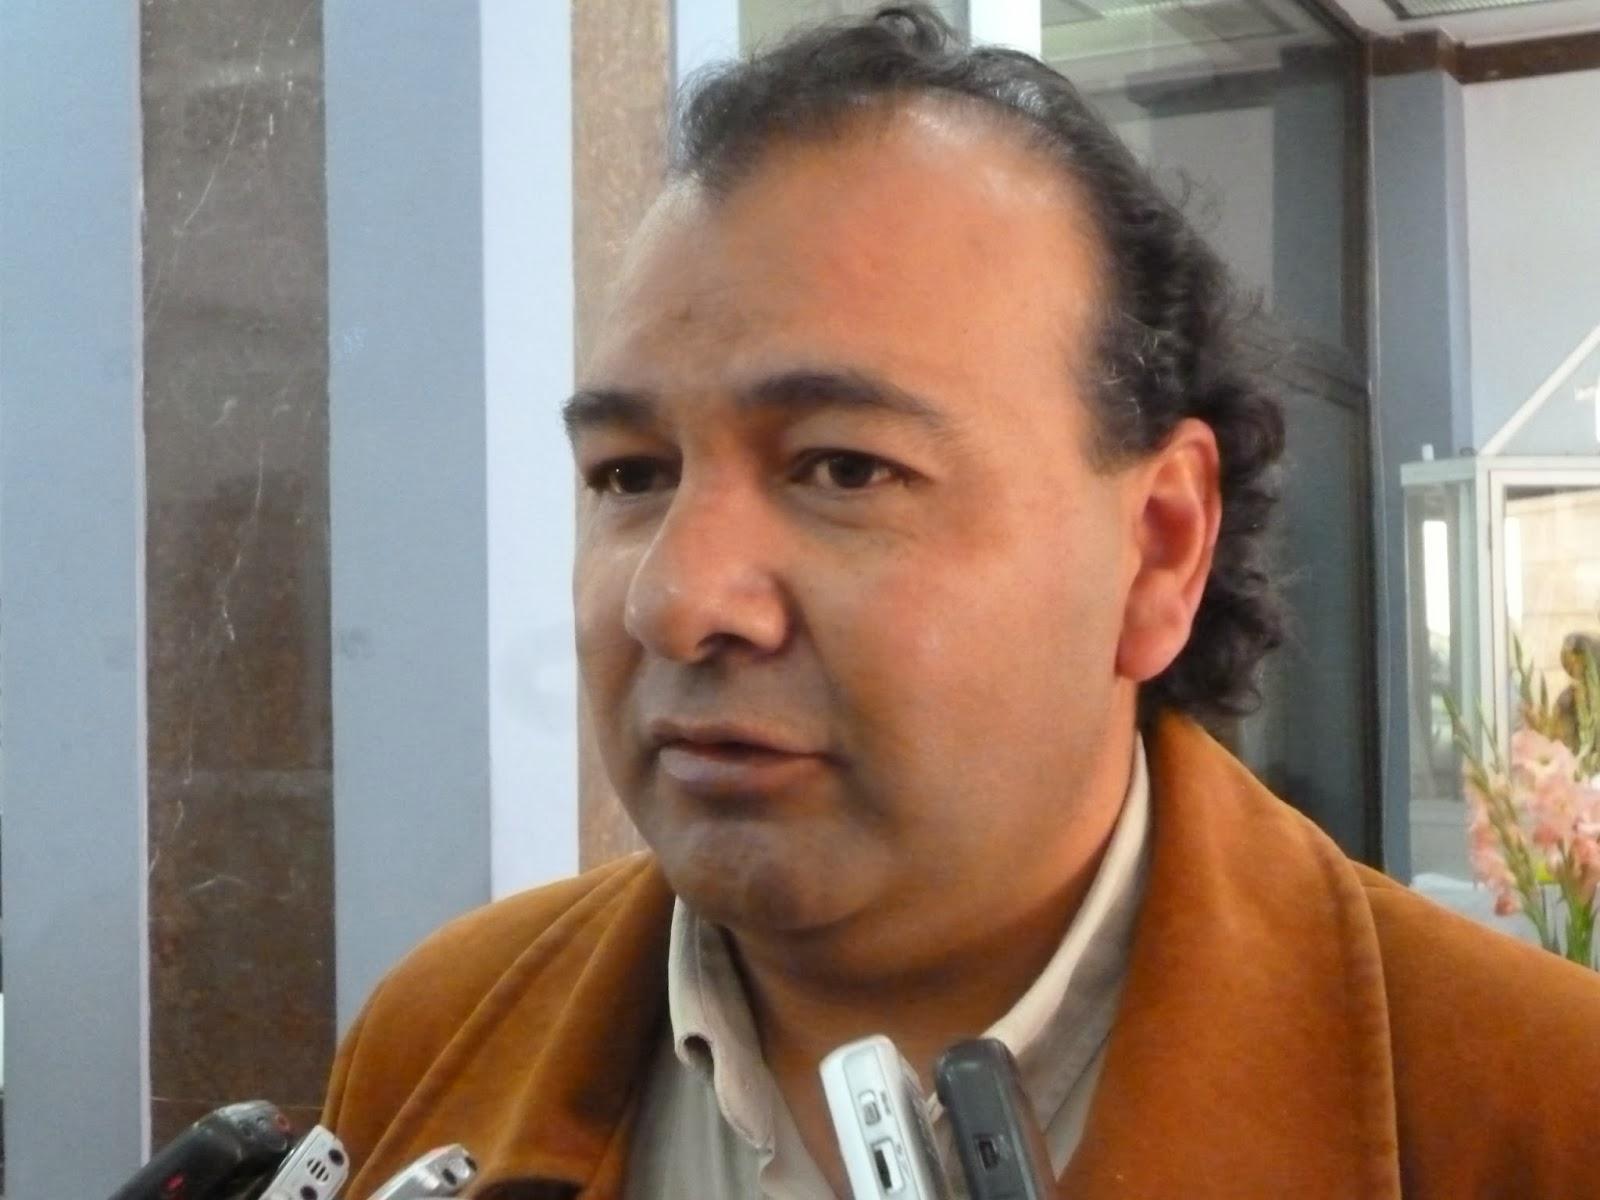 La justicia en Bolivia